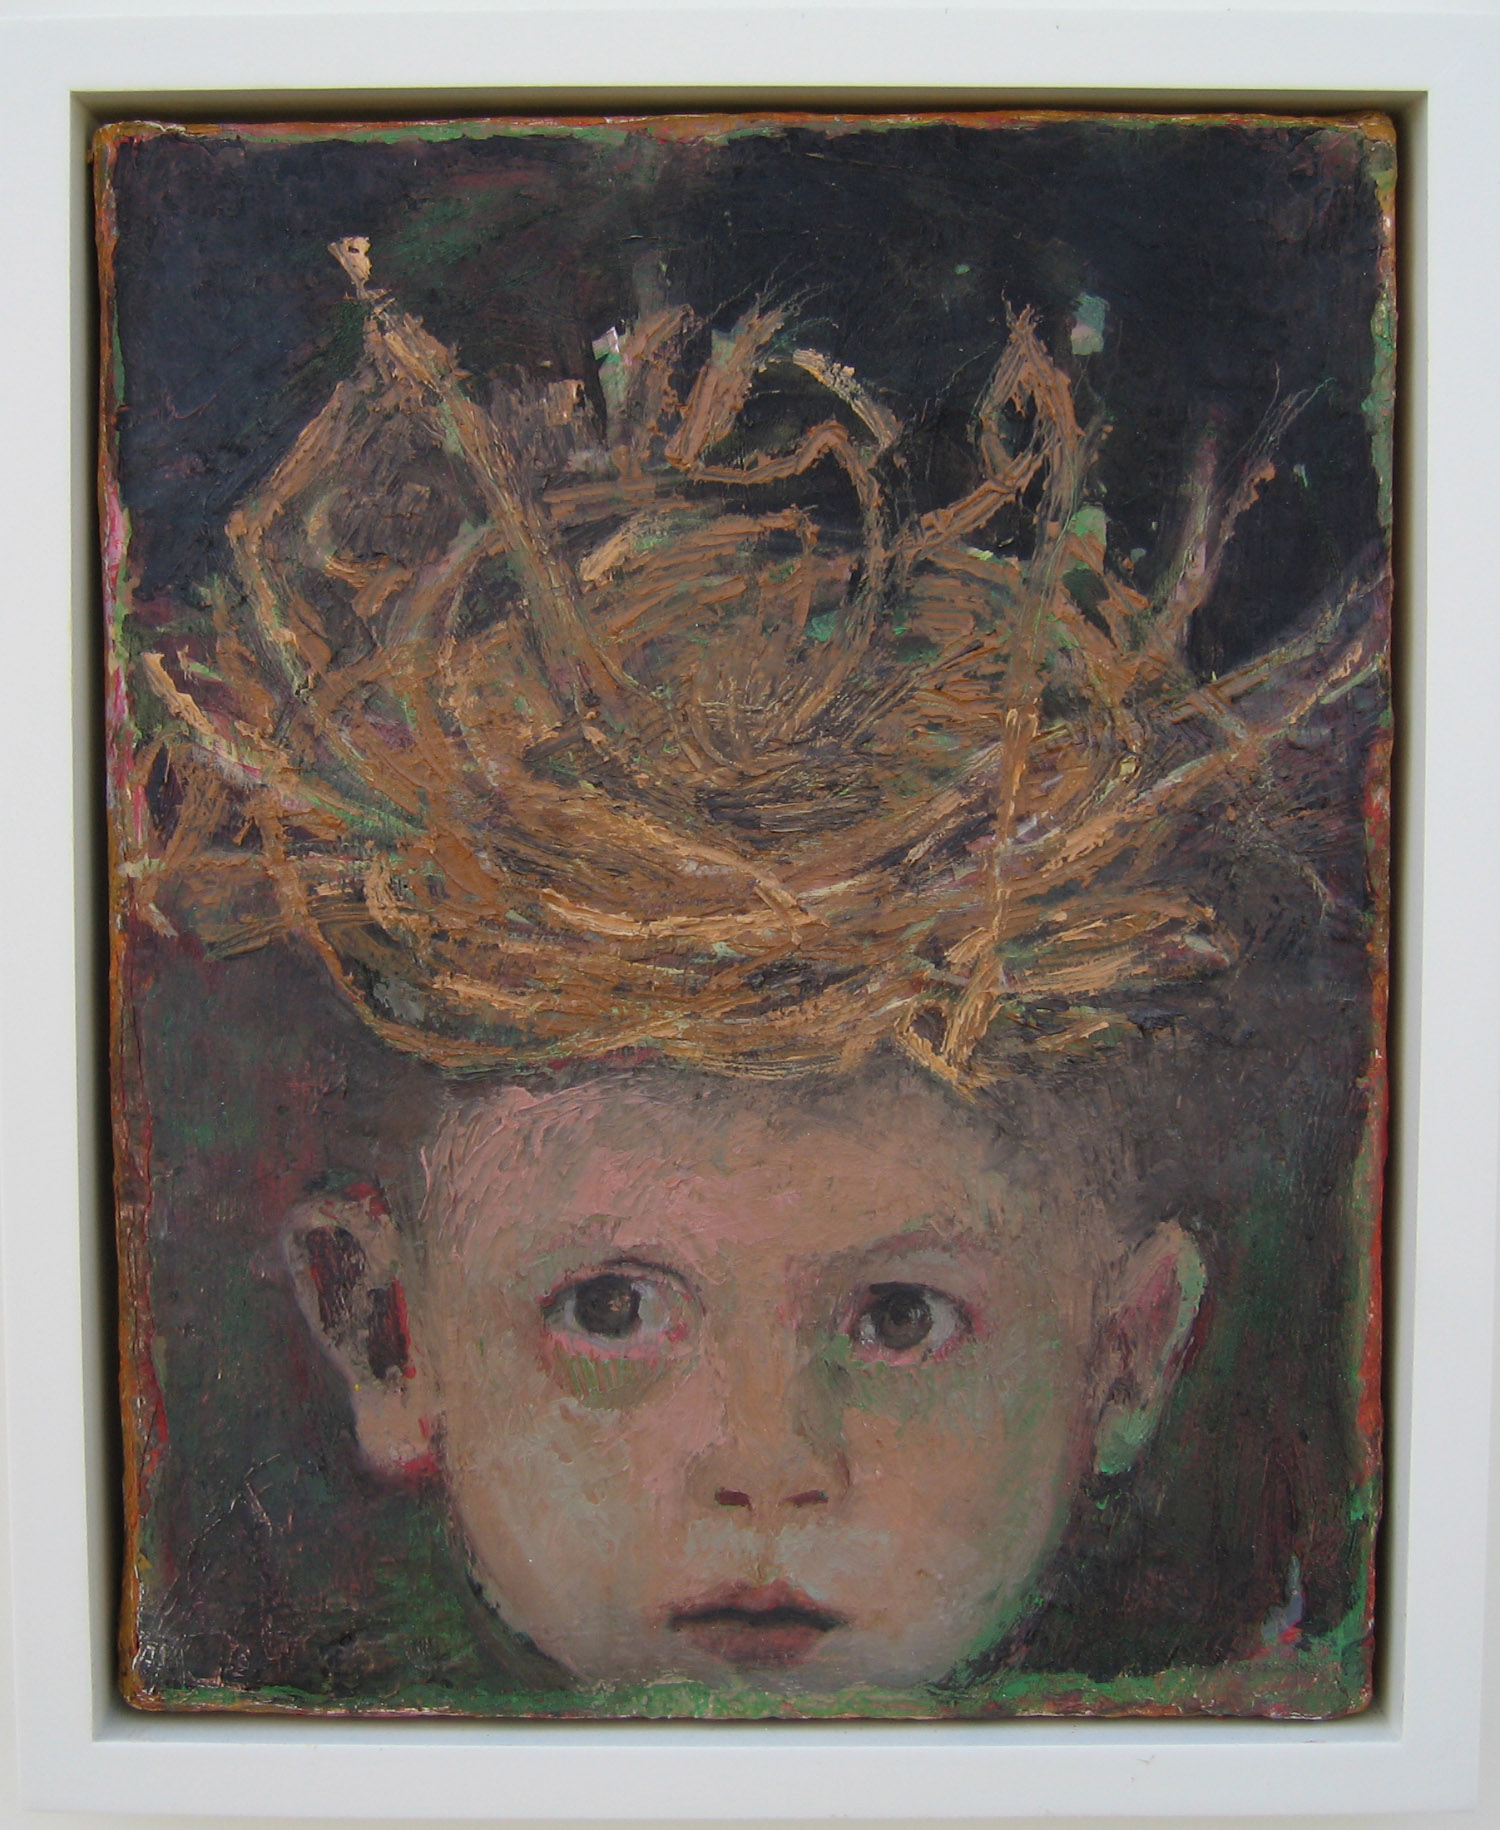 5bd(0) - A Nesting, oil, resins, wax on canvas, 17x15 in. 2006.jpg